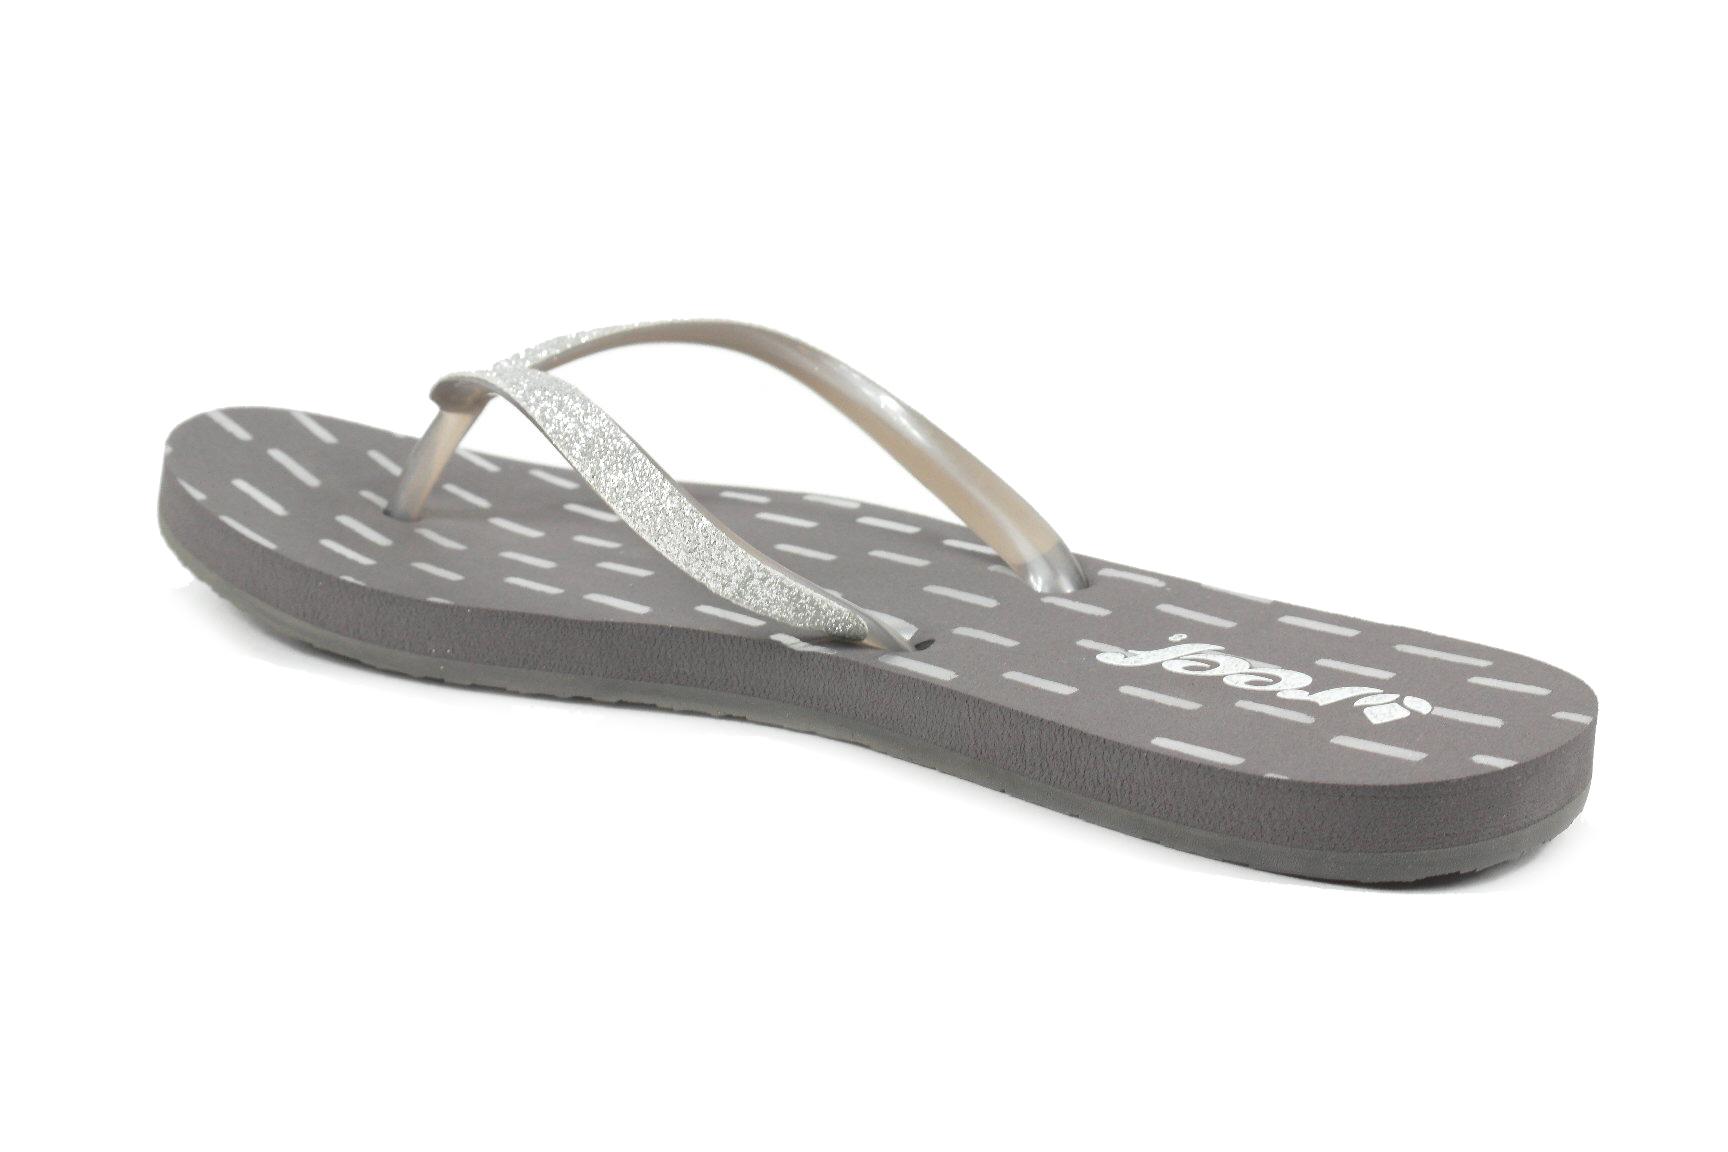 886fa95ac7bd Reef Stargazer Print Dames slippers grijs dessin - Slippers ...